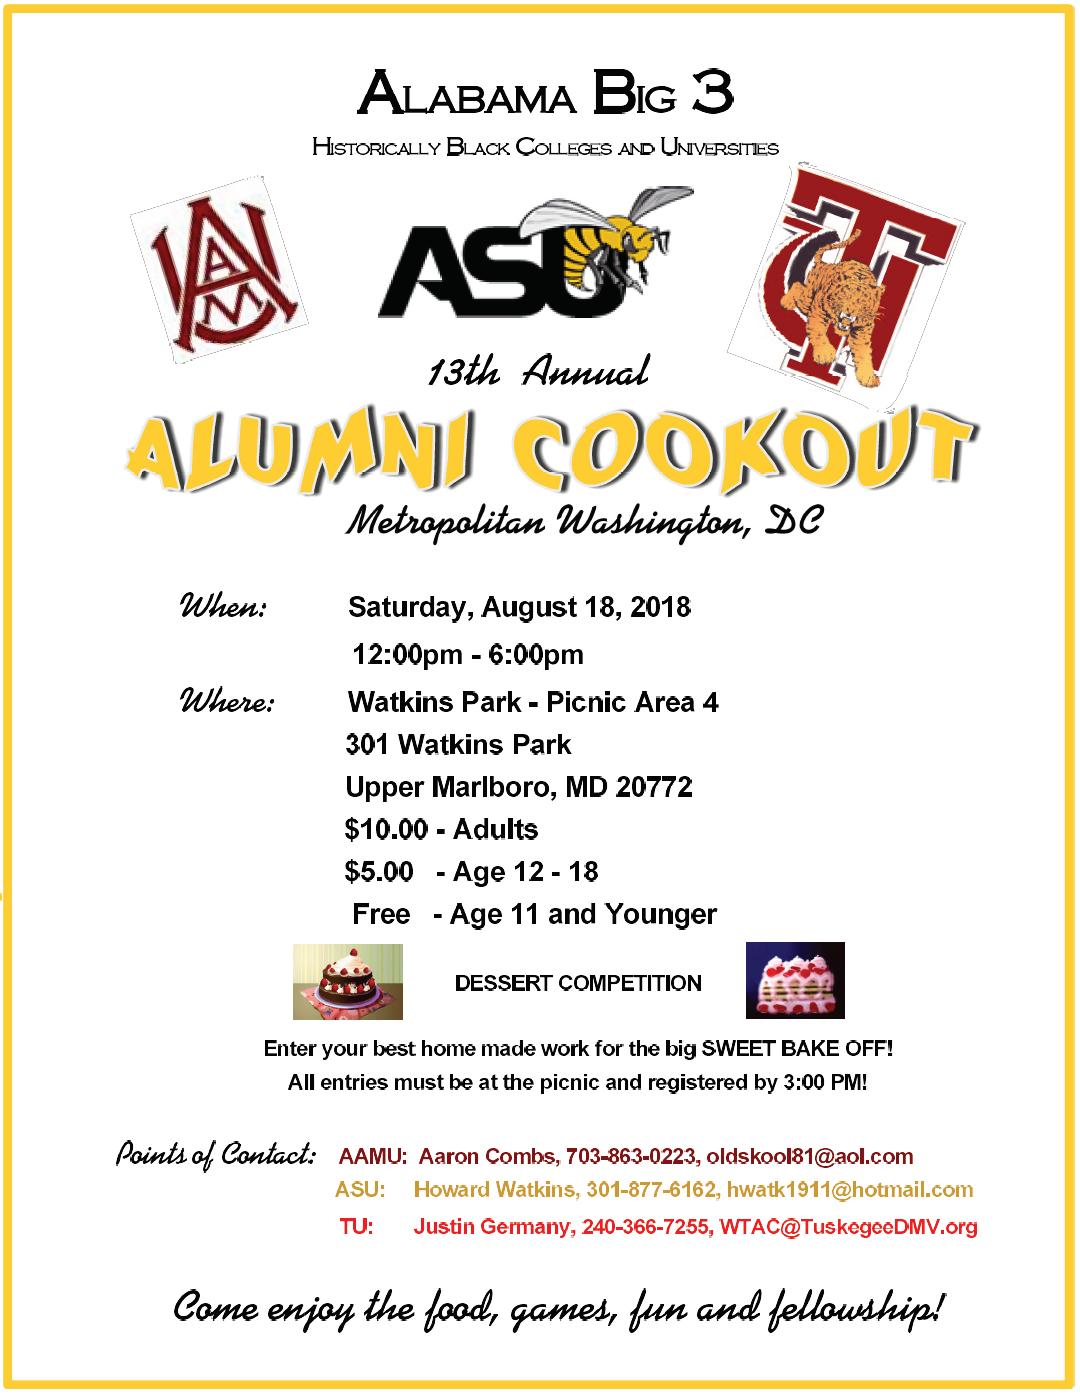 2018 Annual Alabama Big 3 Cookout — The Washington-Tuskegee